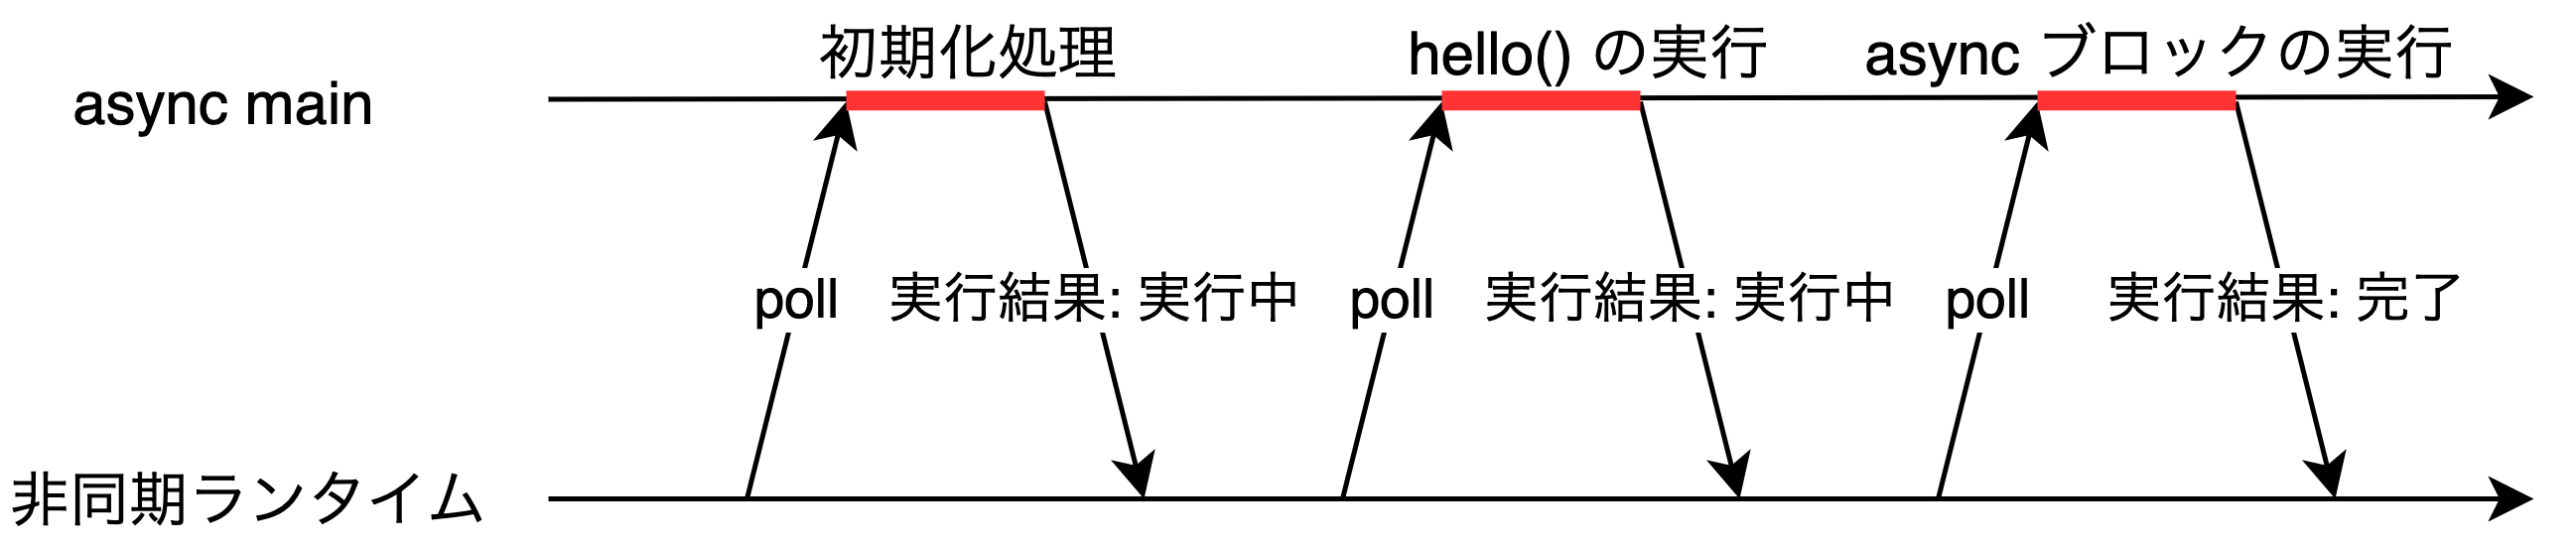 simple-async の実行